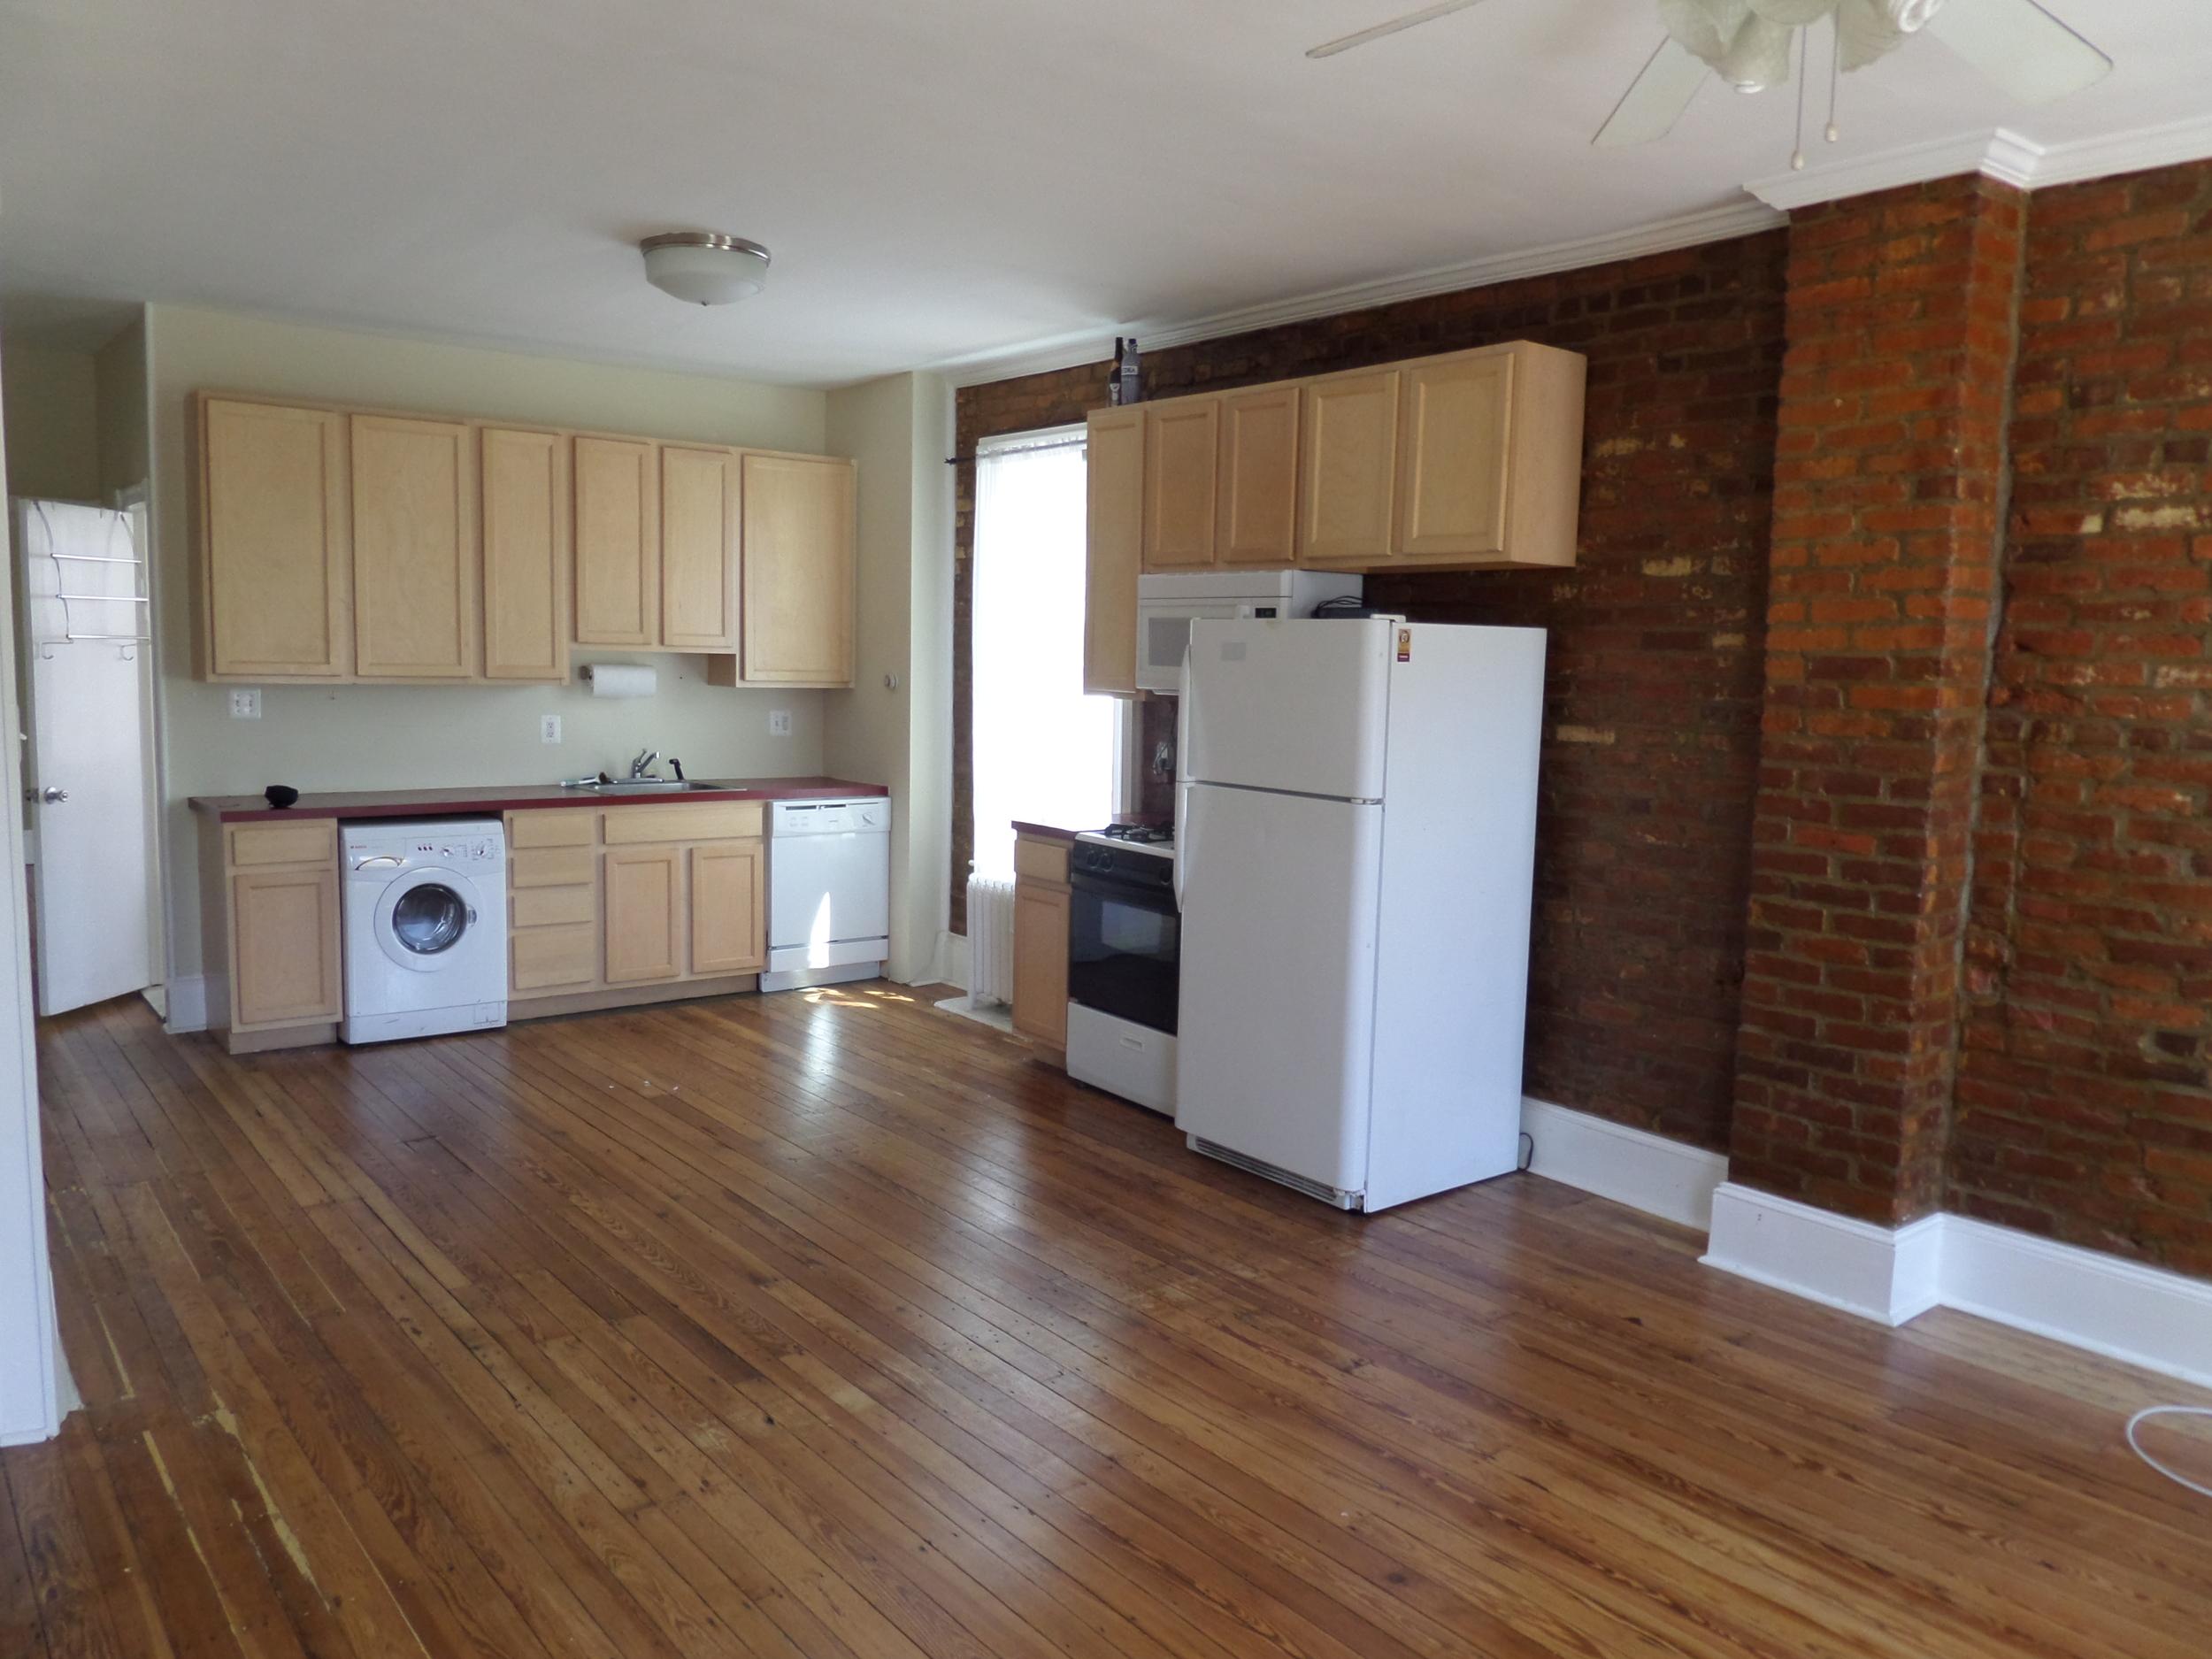 Ridge ave kitchen and floors.JPG